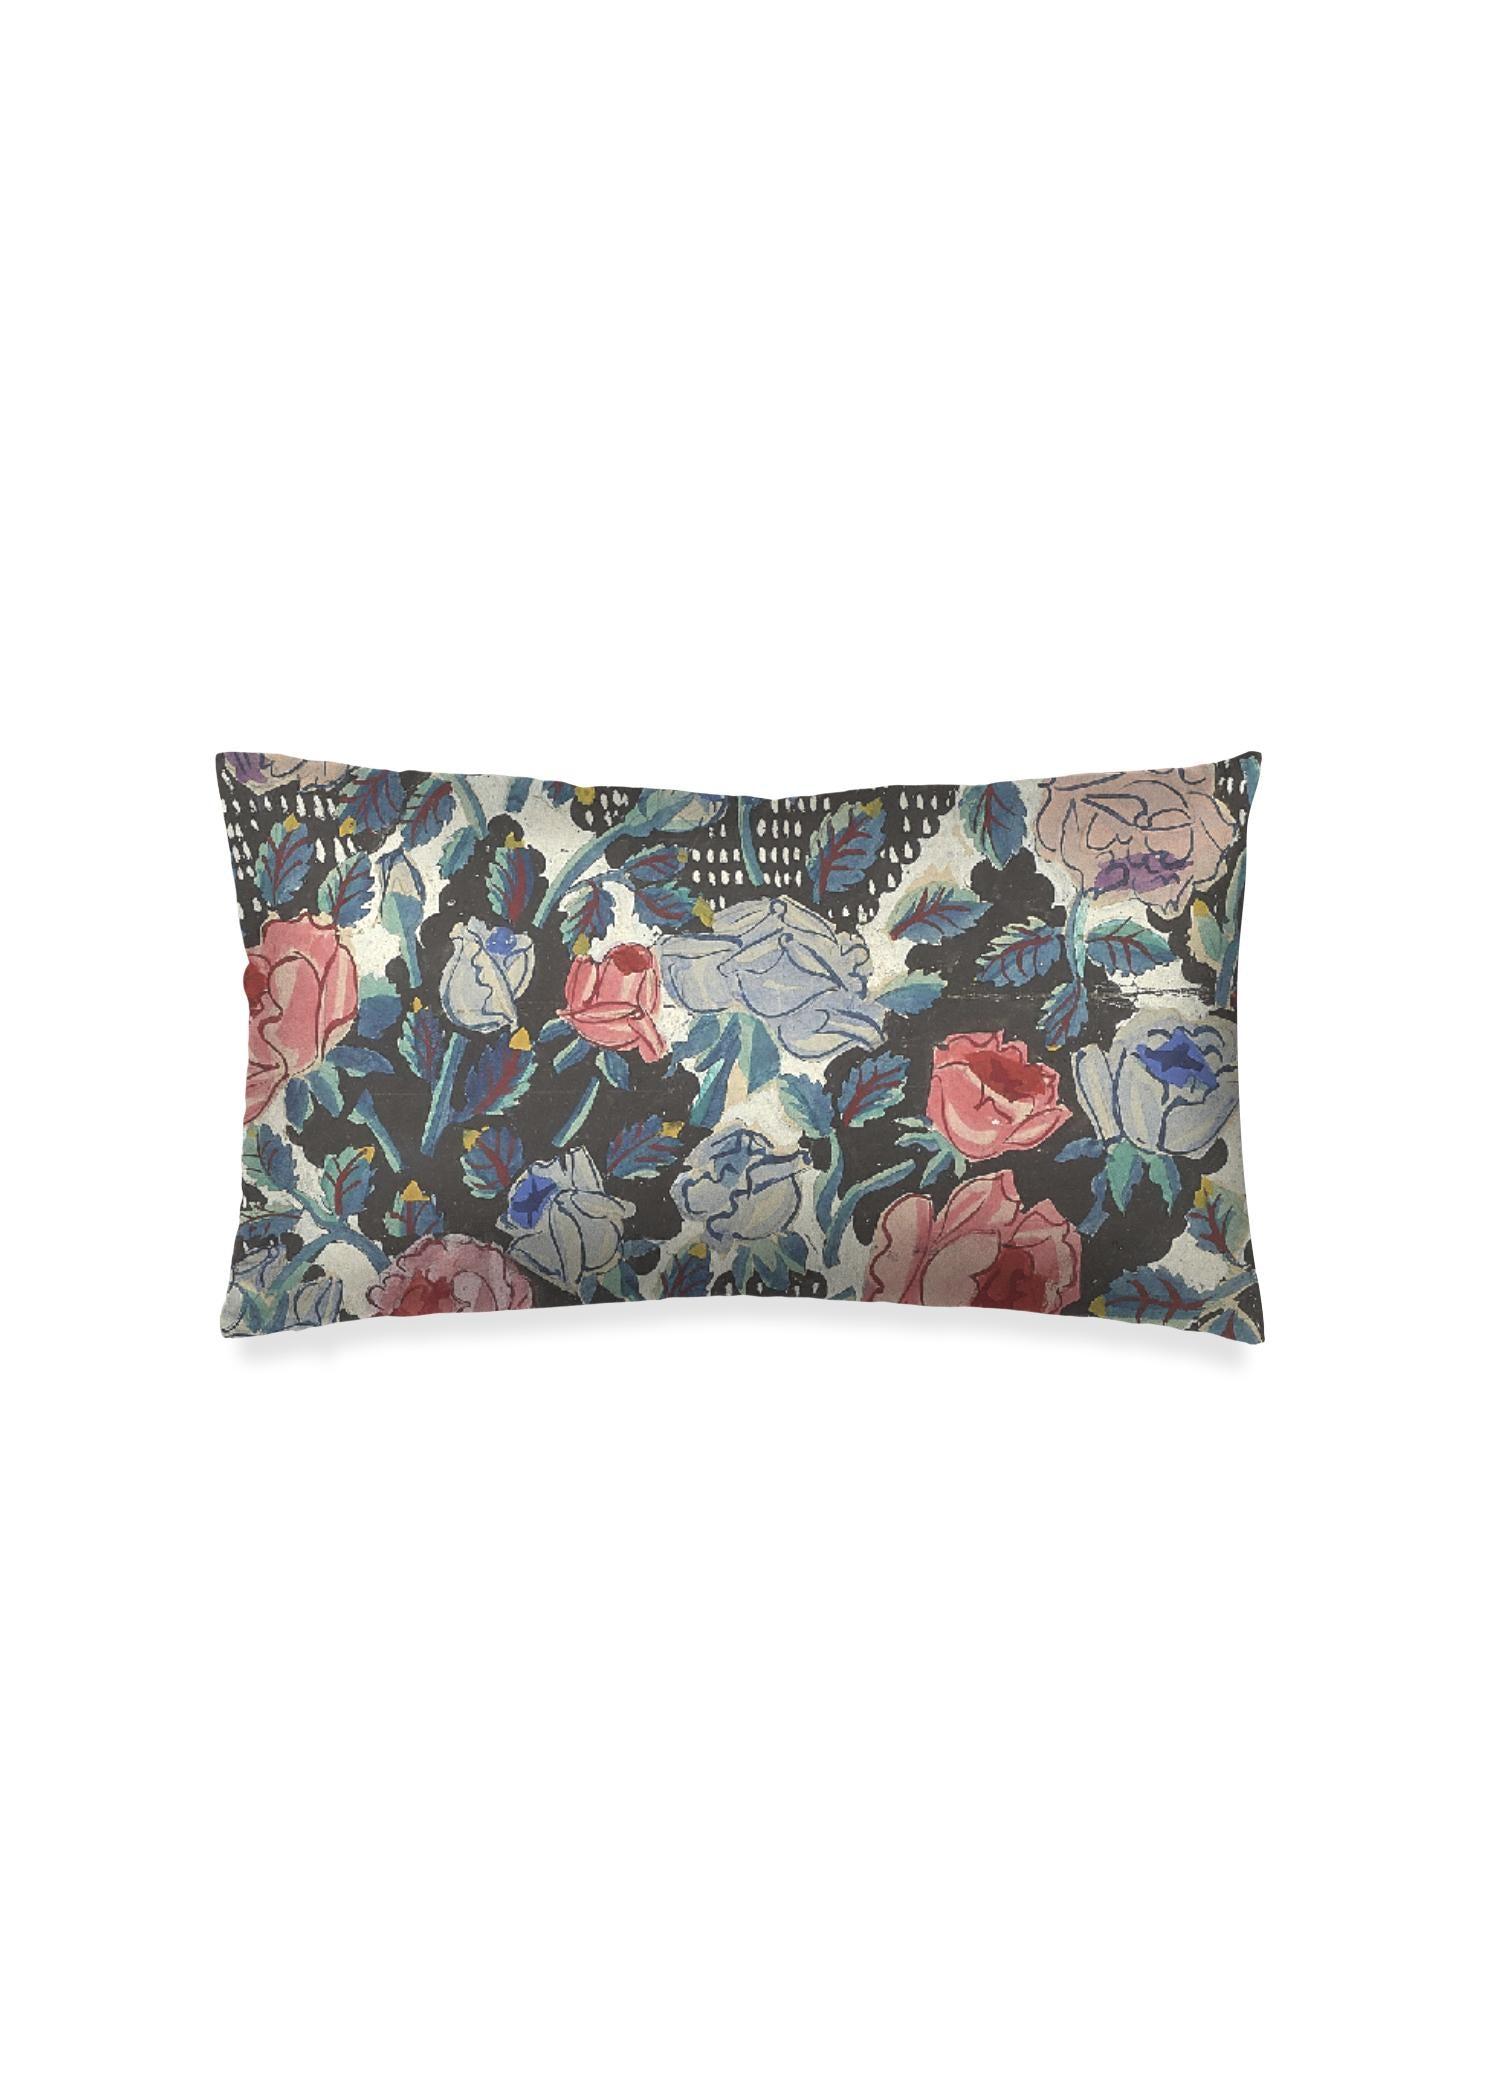 VIDA Oblong Pillow - Rose Garden by VIDA Original Artist  - Size: Luster